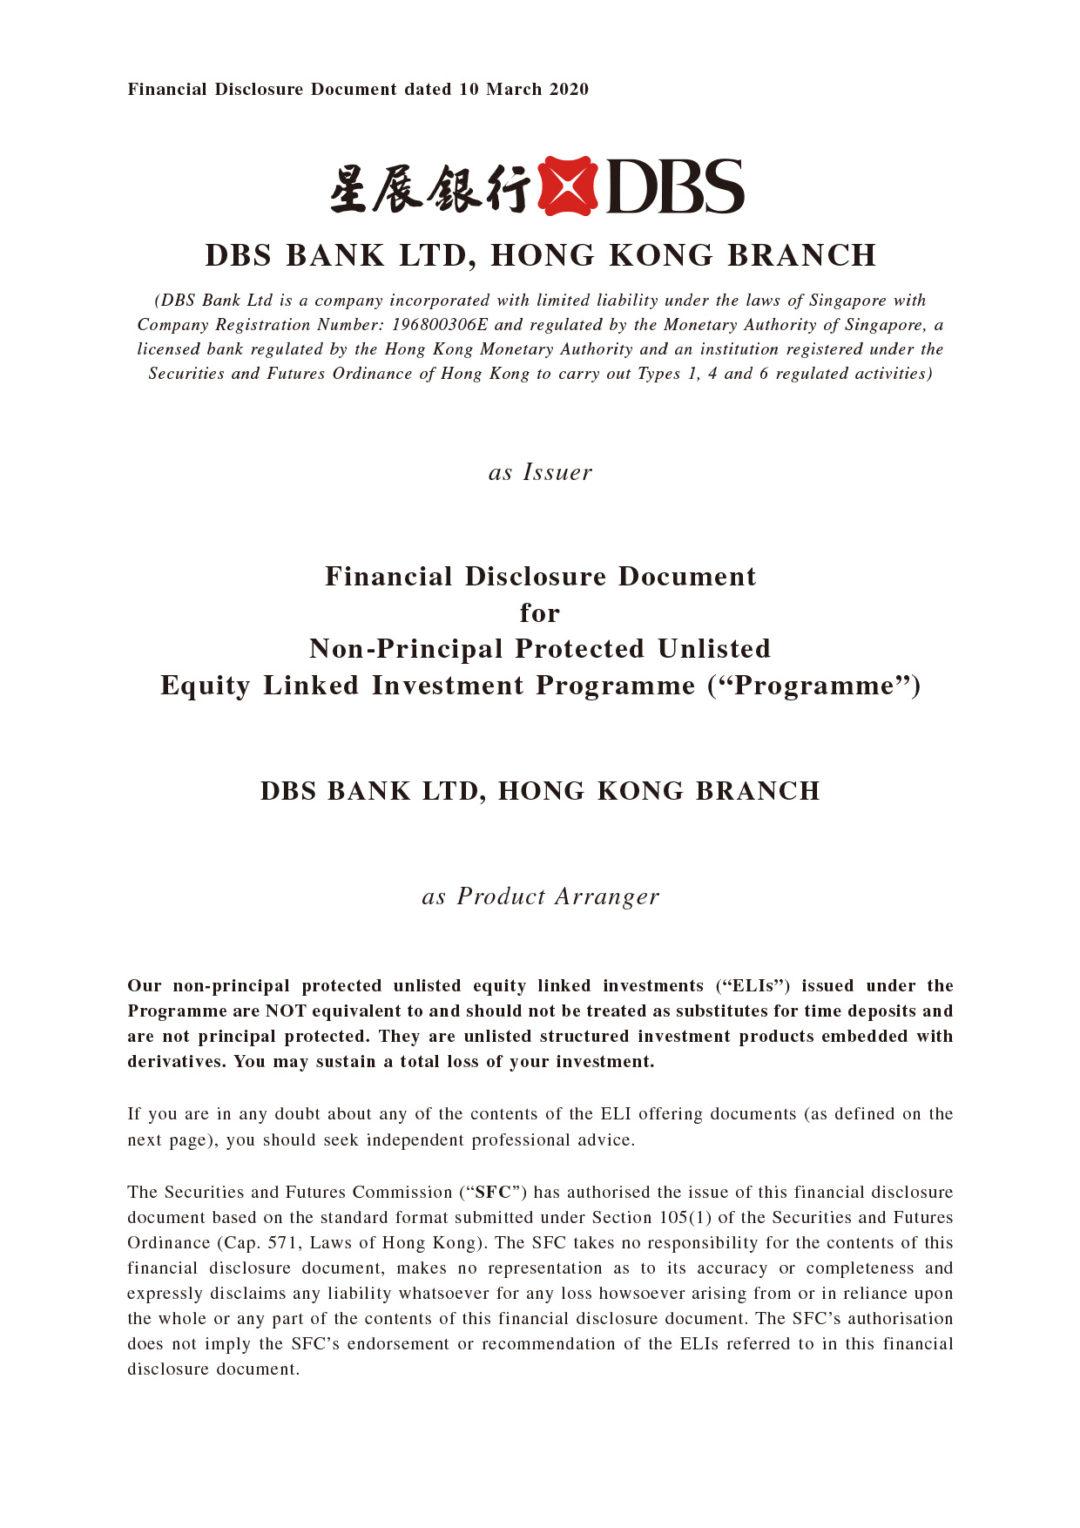 DBS Bank Ltd, Hong Kong Branch